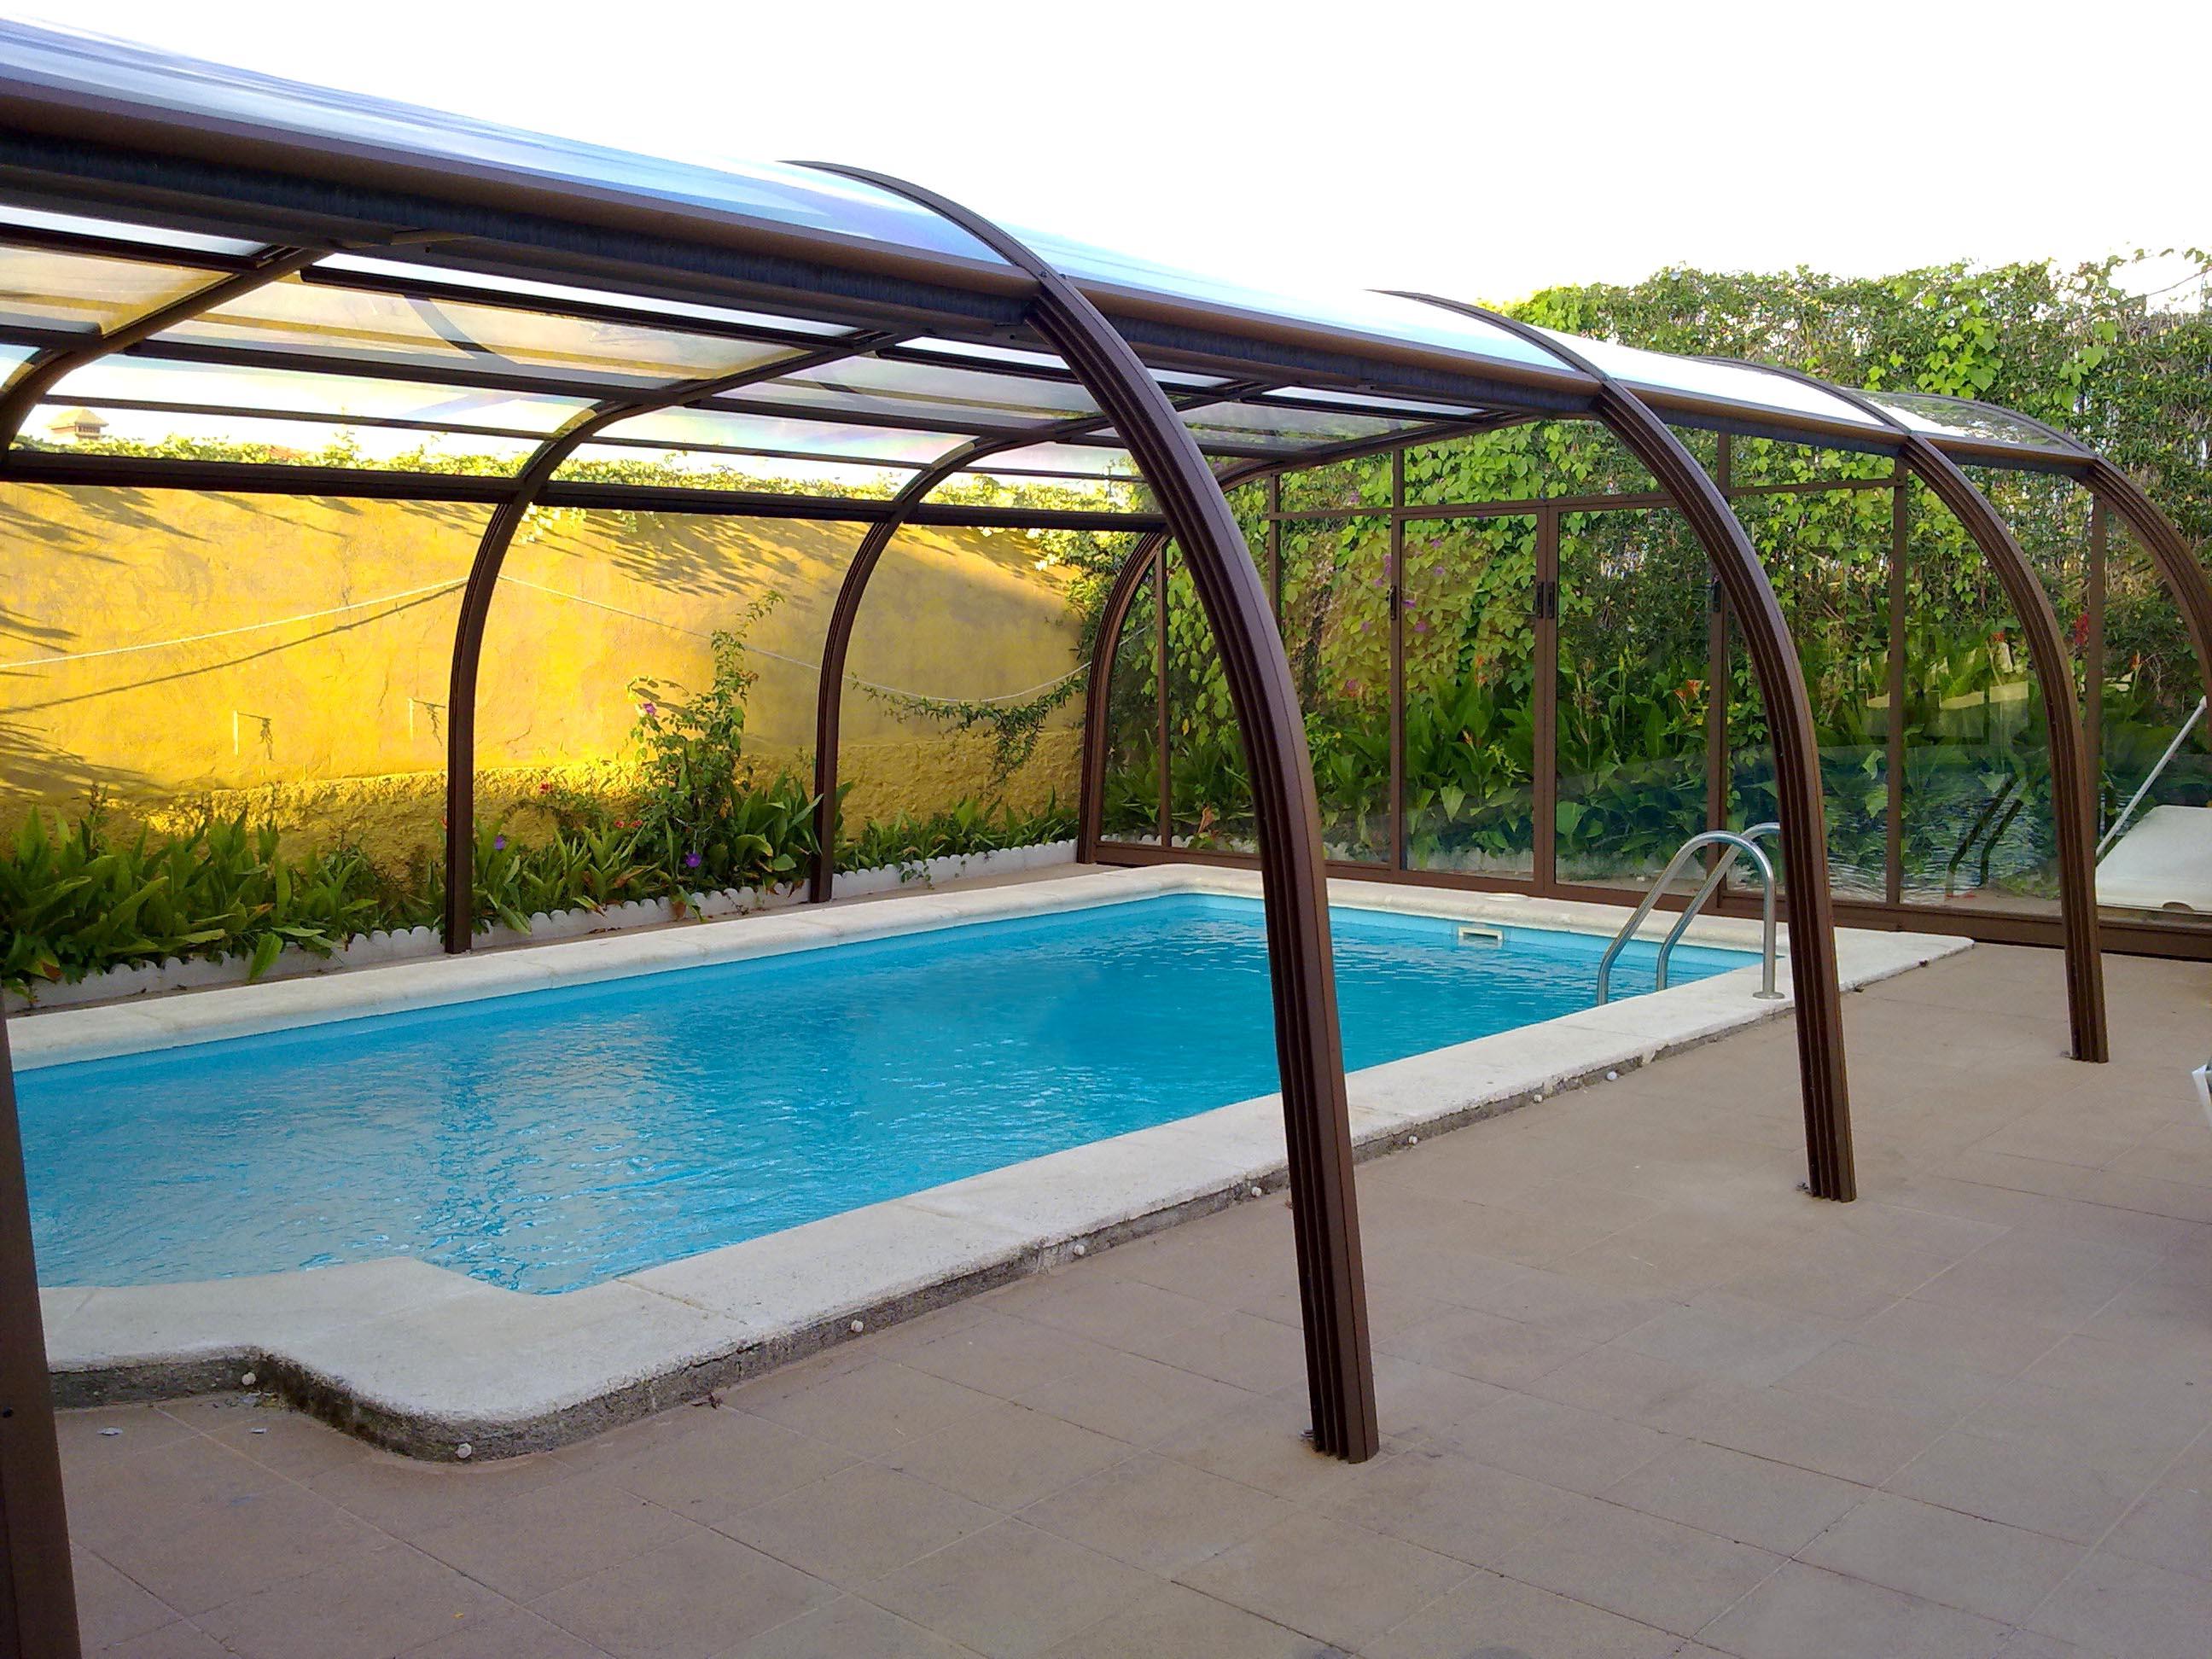 Verona vision ref covers cubiertas de piscina for Cubierta de piscina